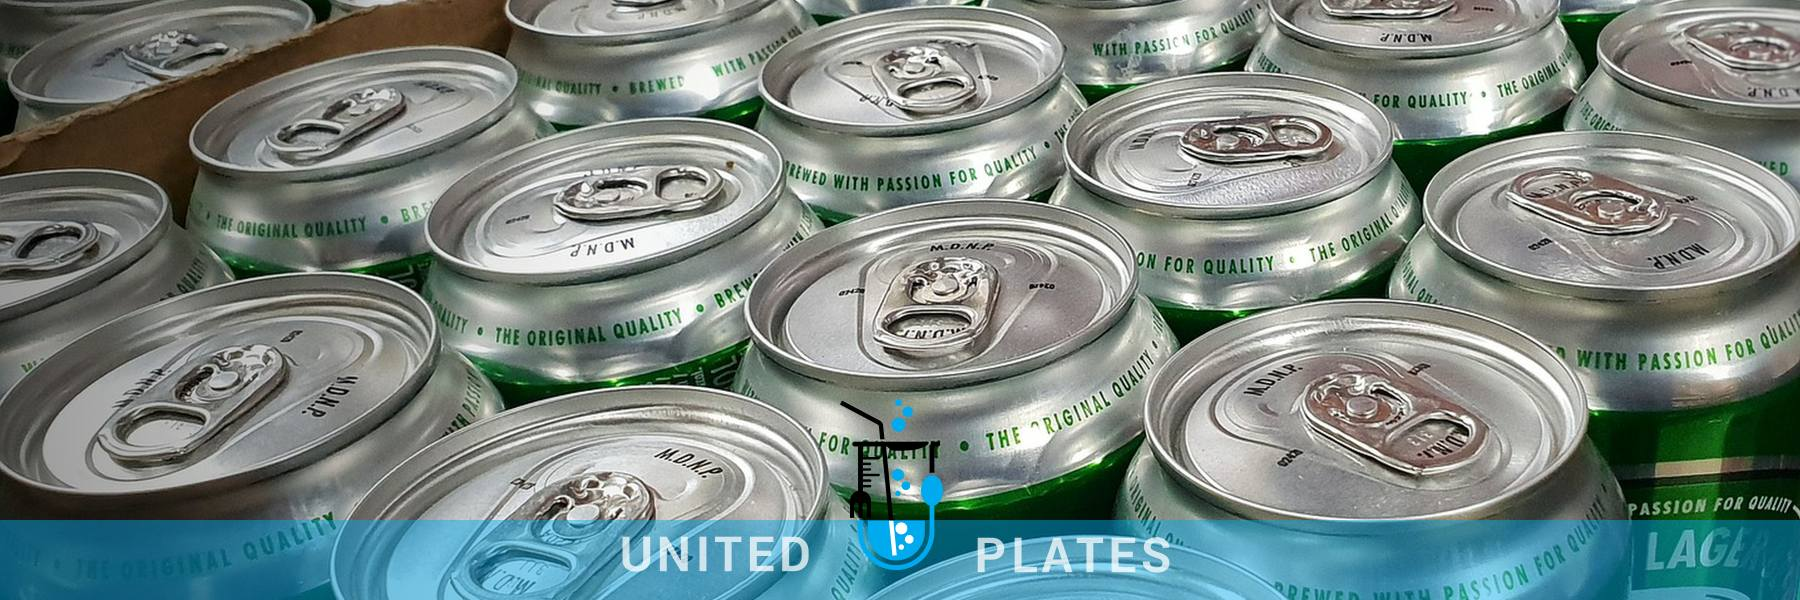 united plates drinks beverages consultant dublin ireland